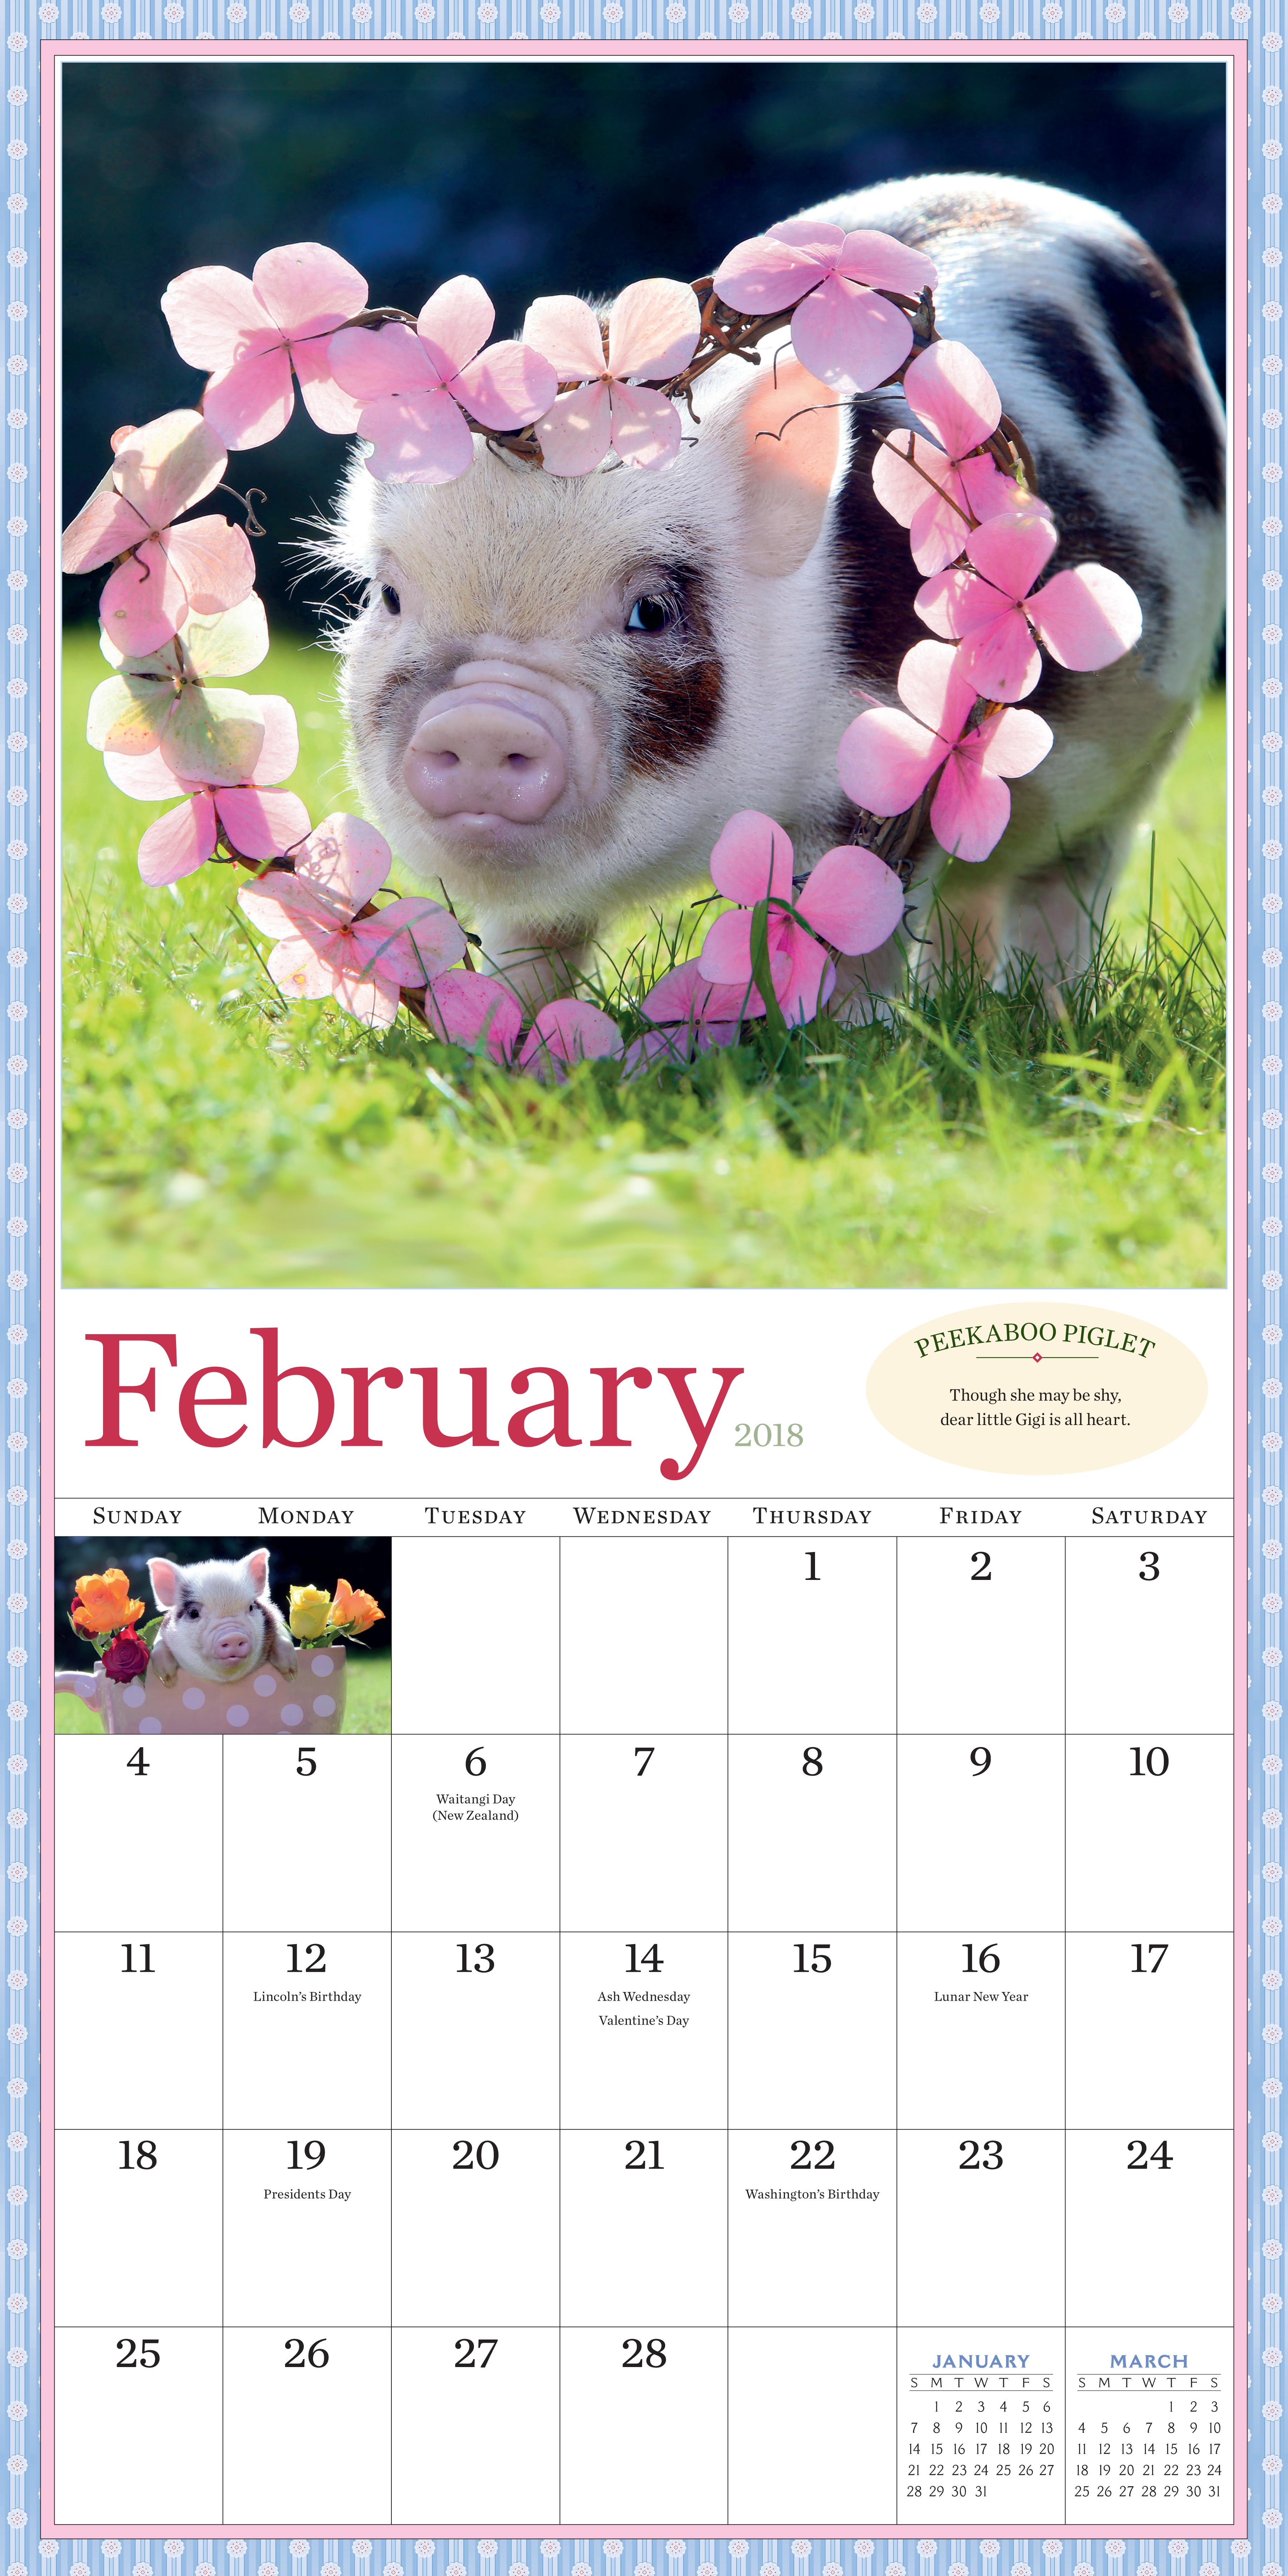 Pocket pigs wall calendar 2018 workman publishing download high res image voltagebd Gallery